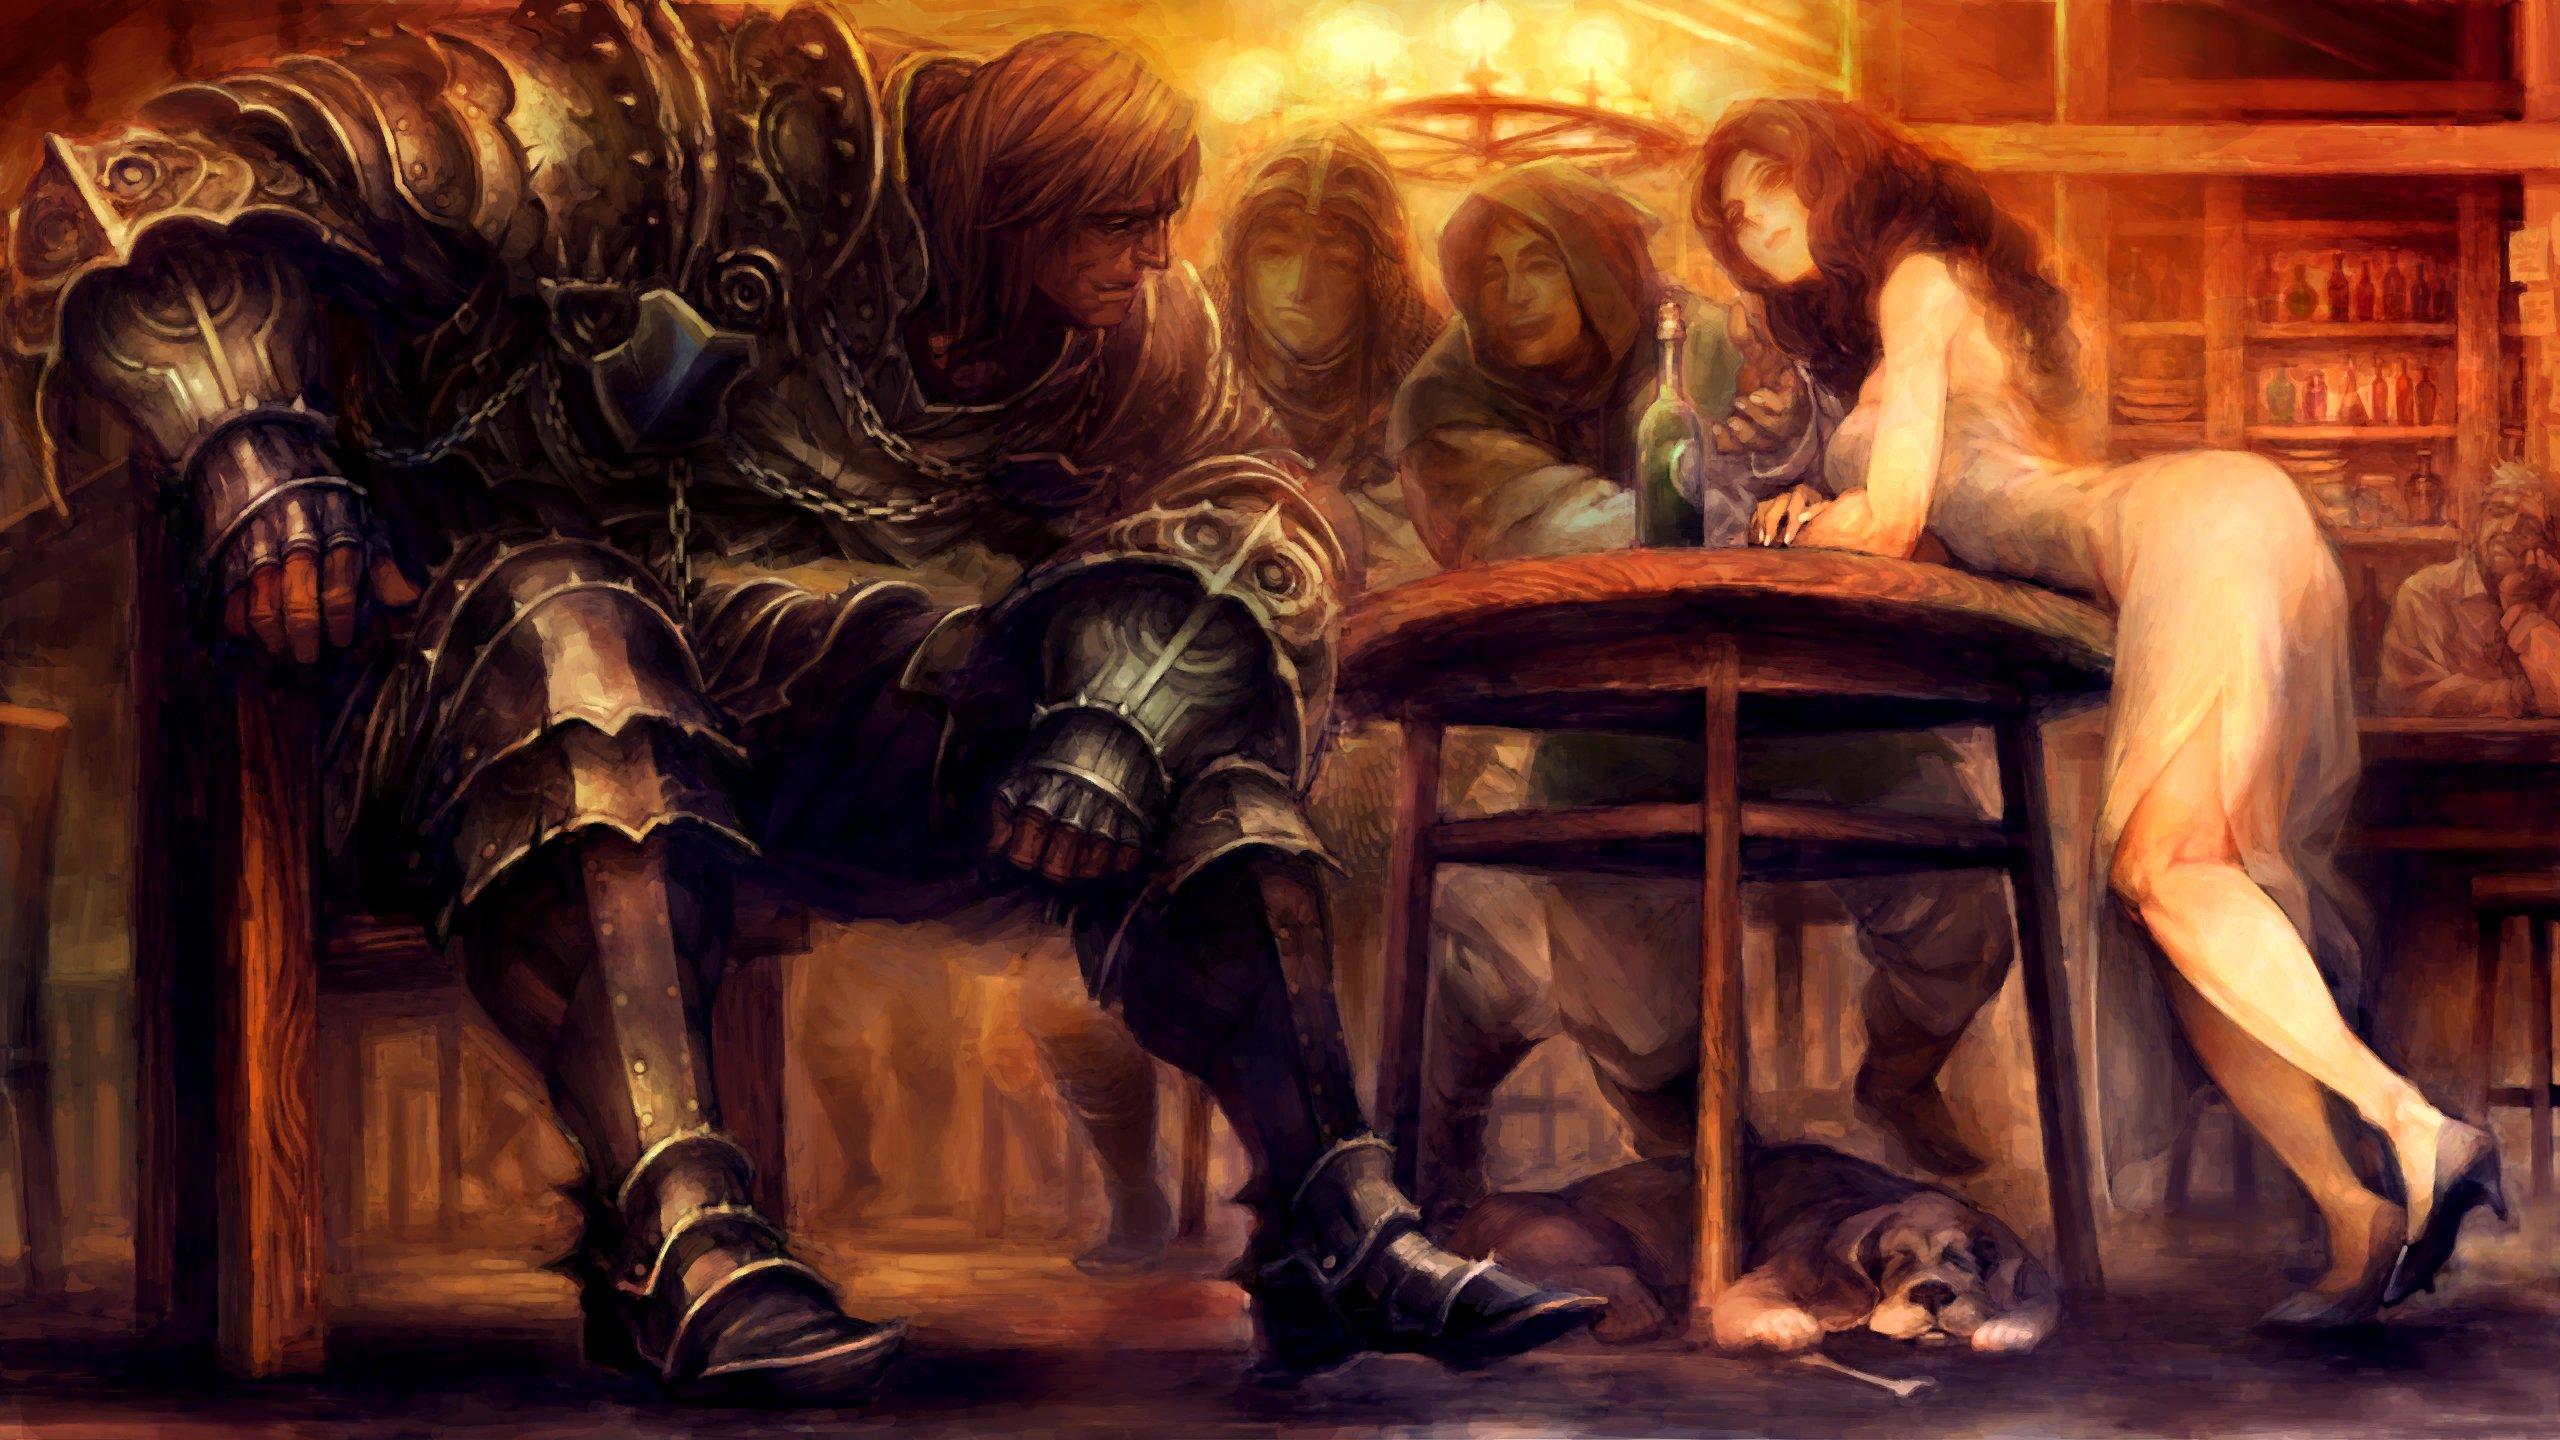 Rpg Fantasy Family Medieval Fighting Dragons Crown 74 Wallpaper